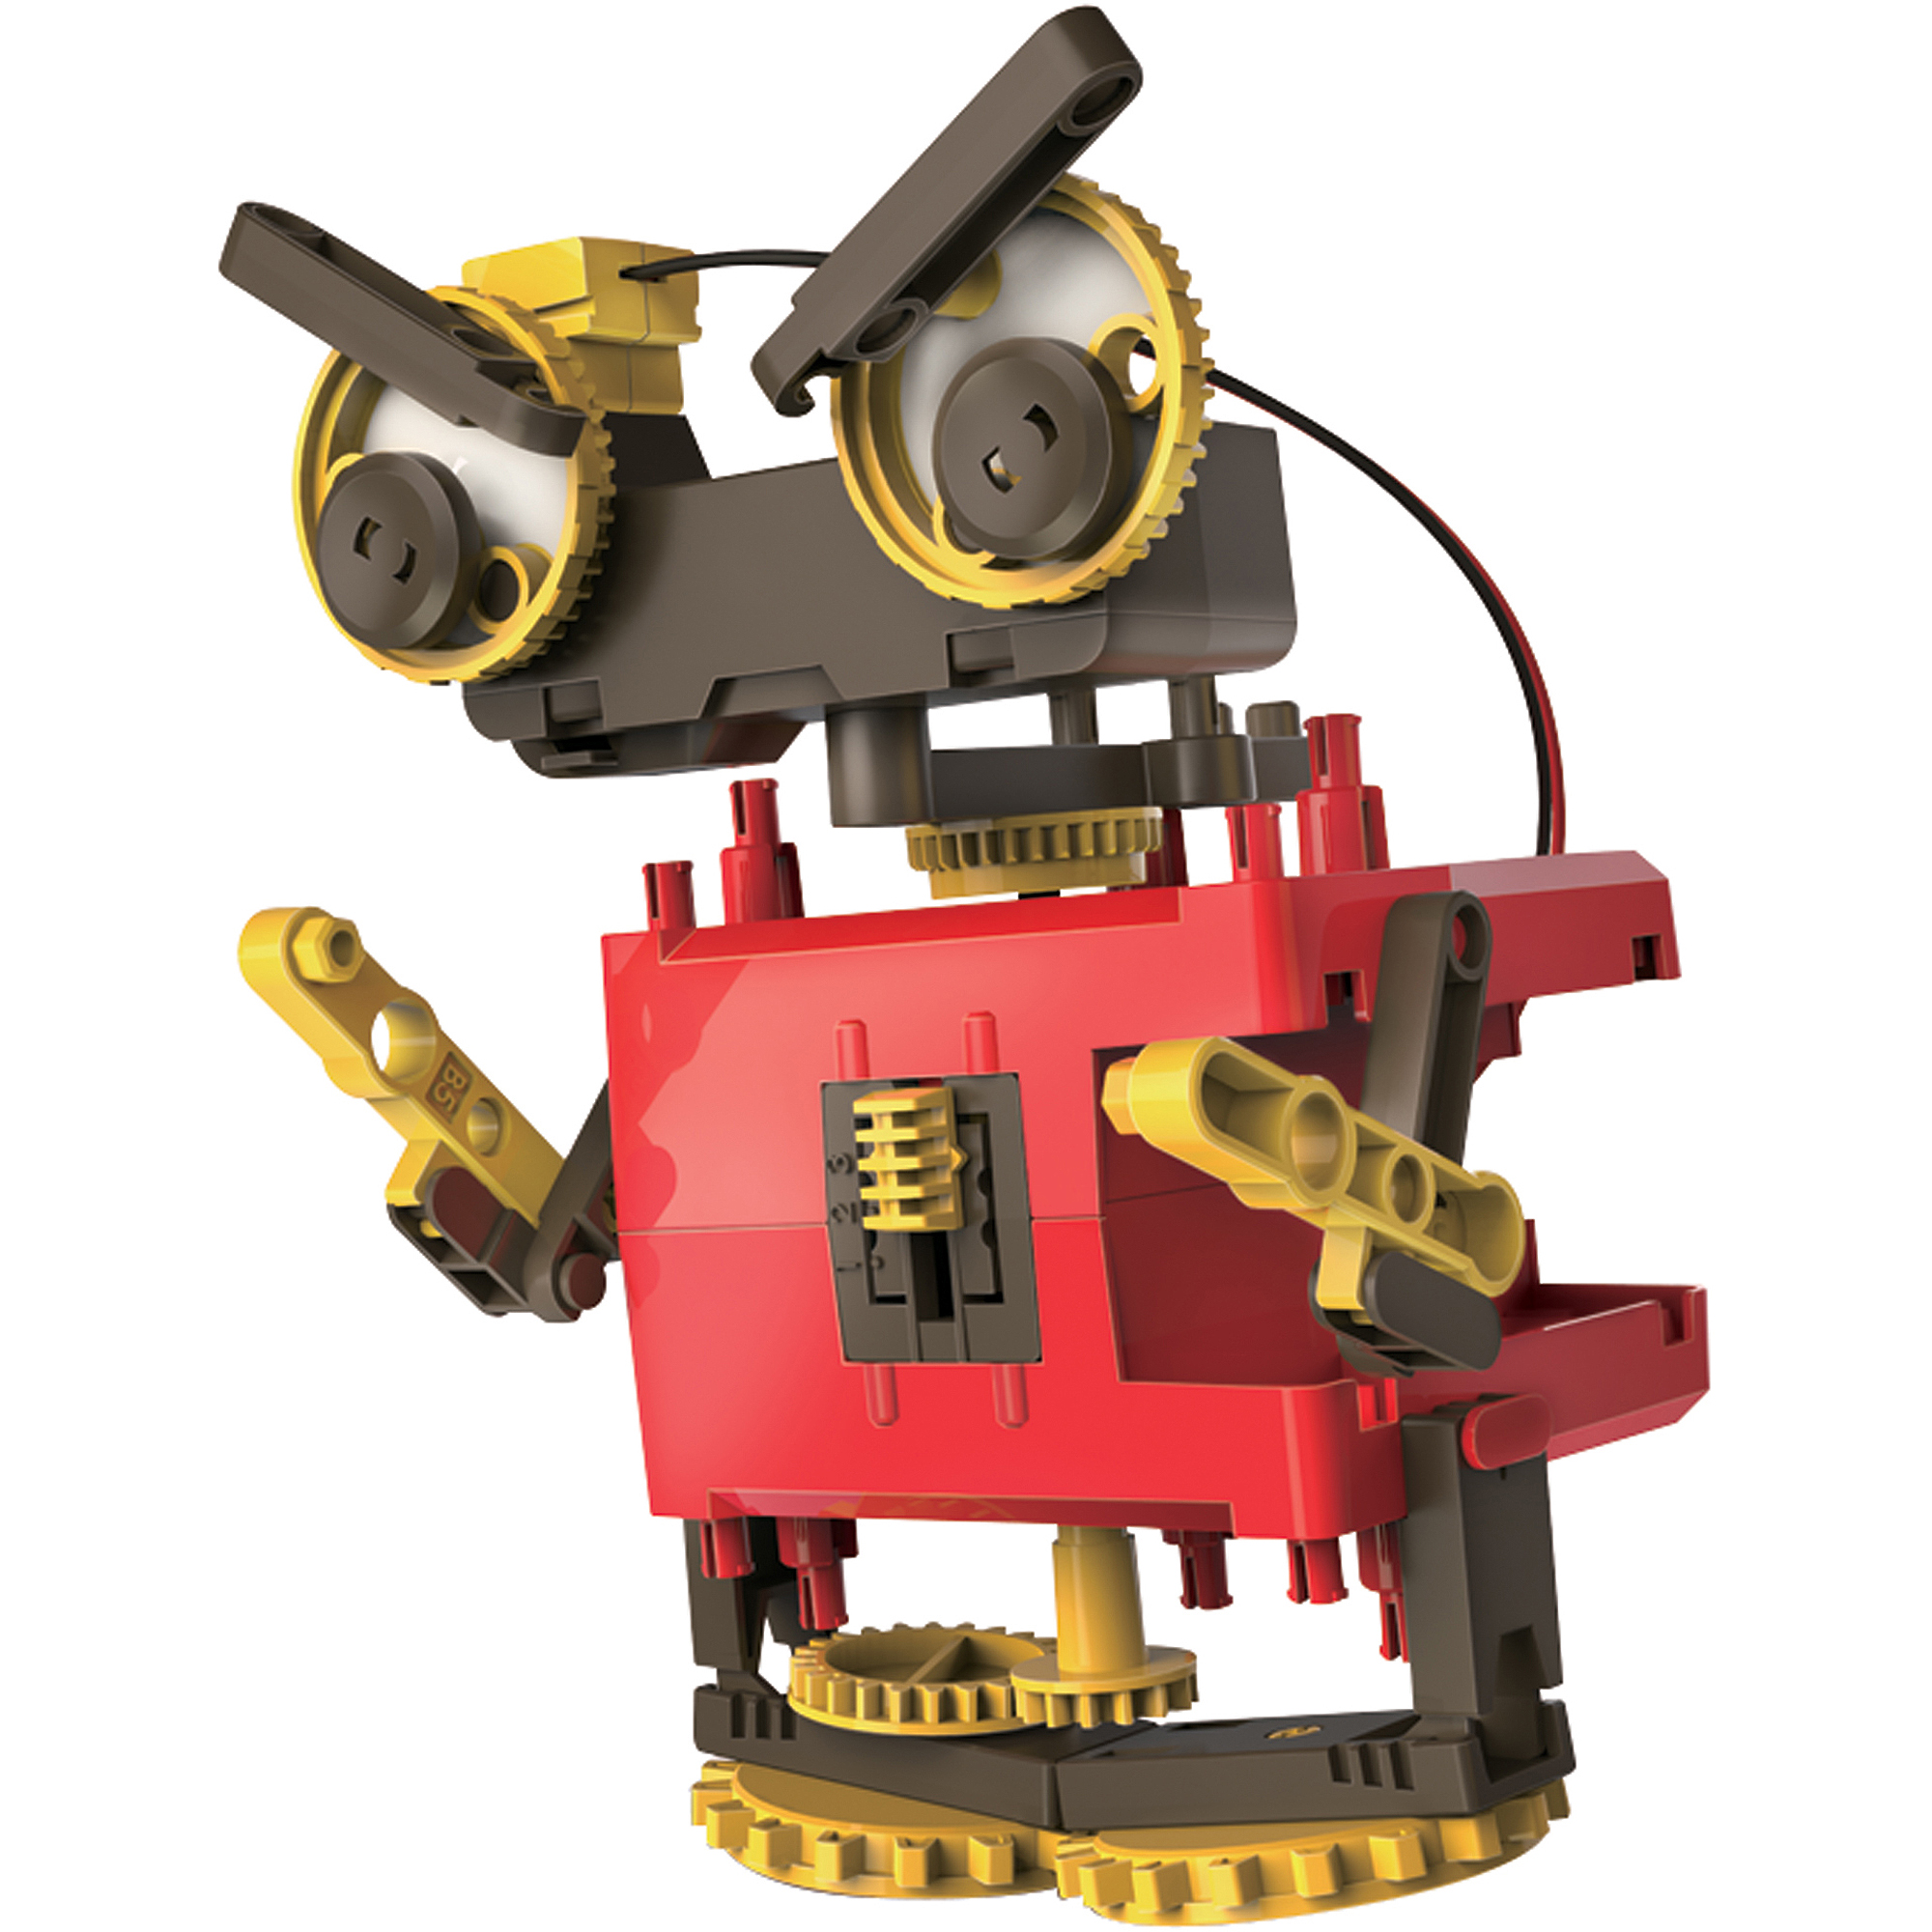 OWI EM4 Educational Motorized Robot Kit Walmart